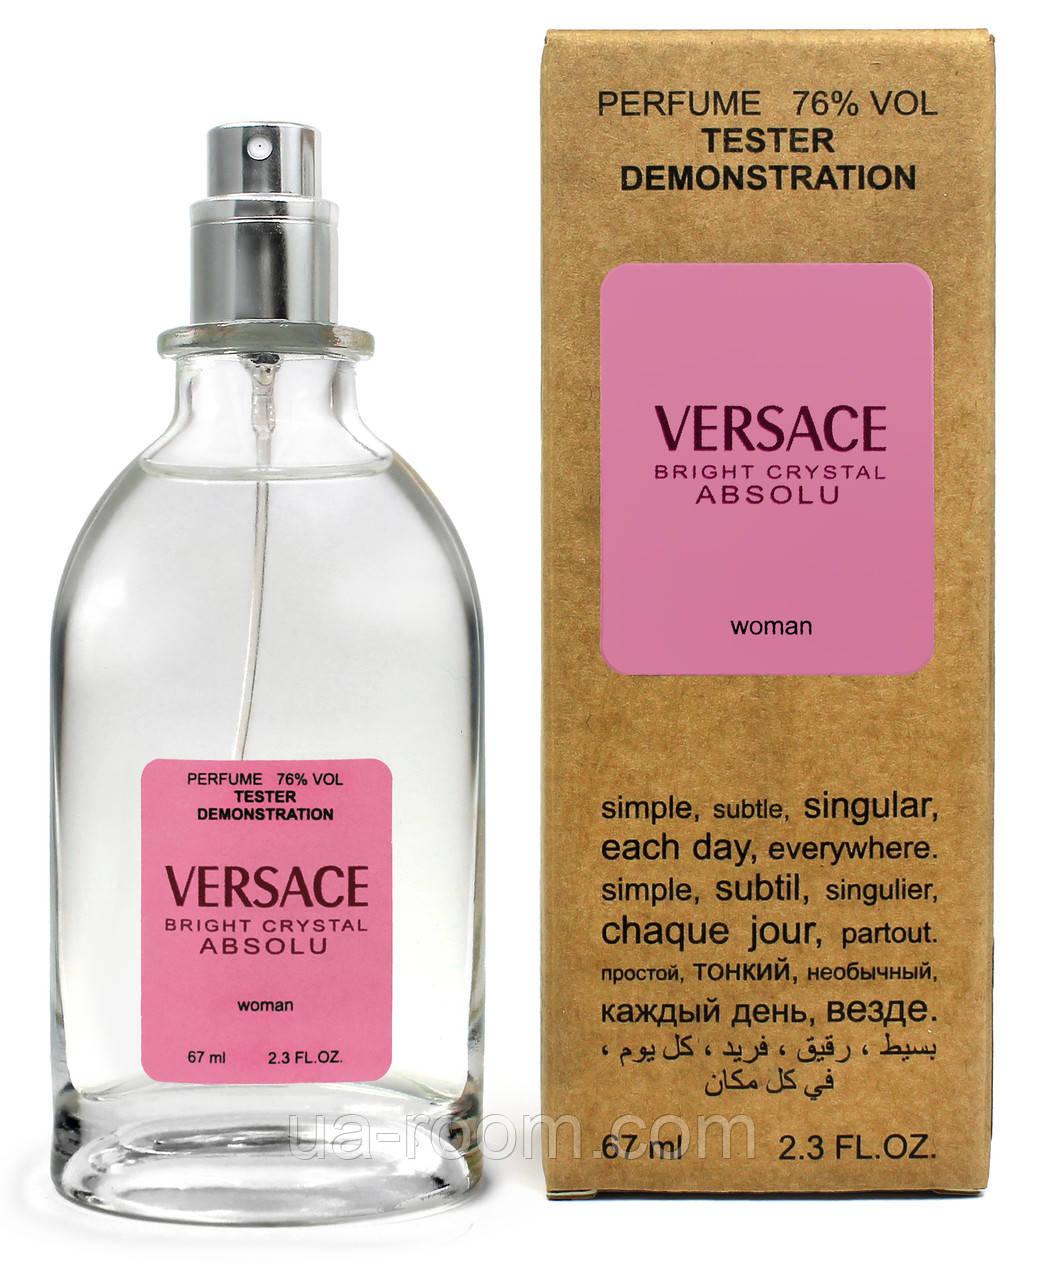 Тестер женский Versace Bright Crystal Absolu, 67 мл.